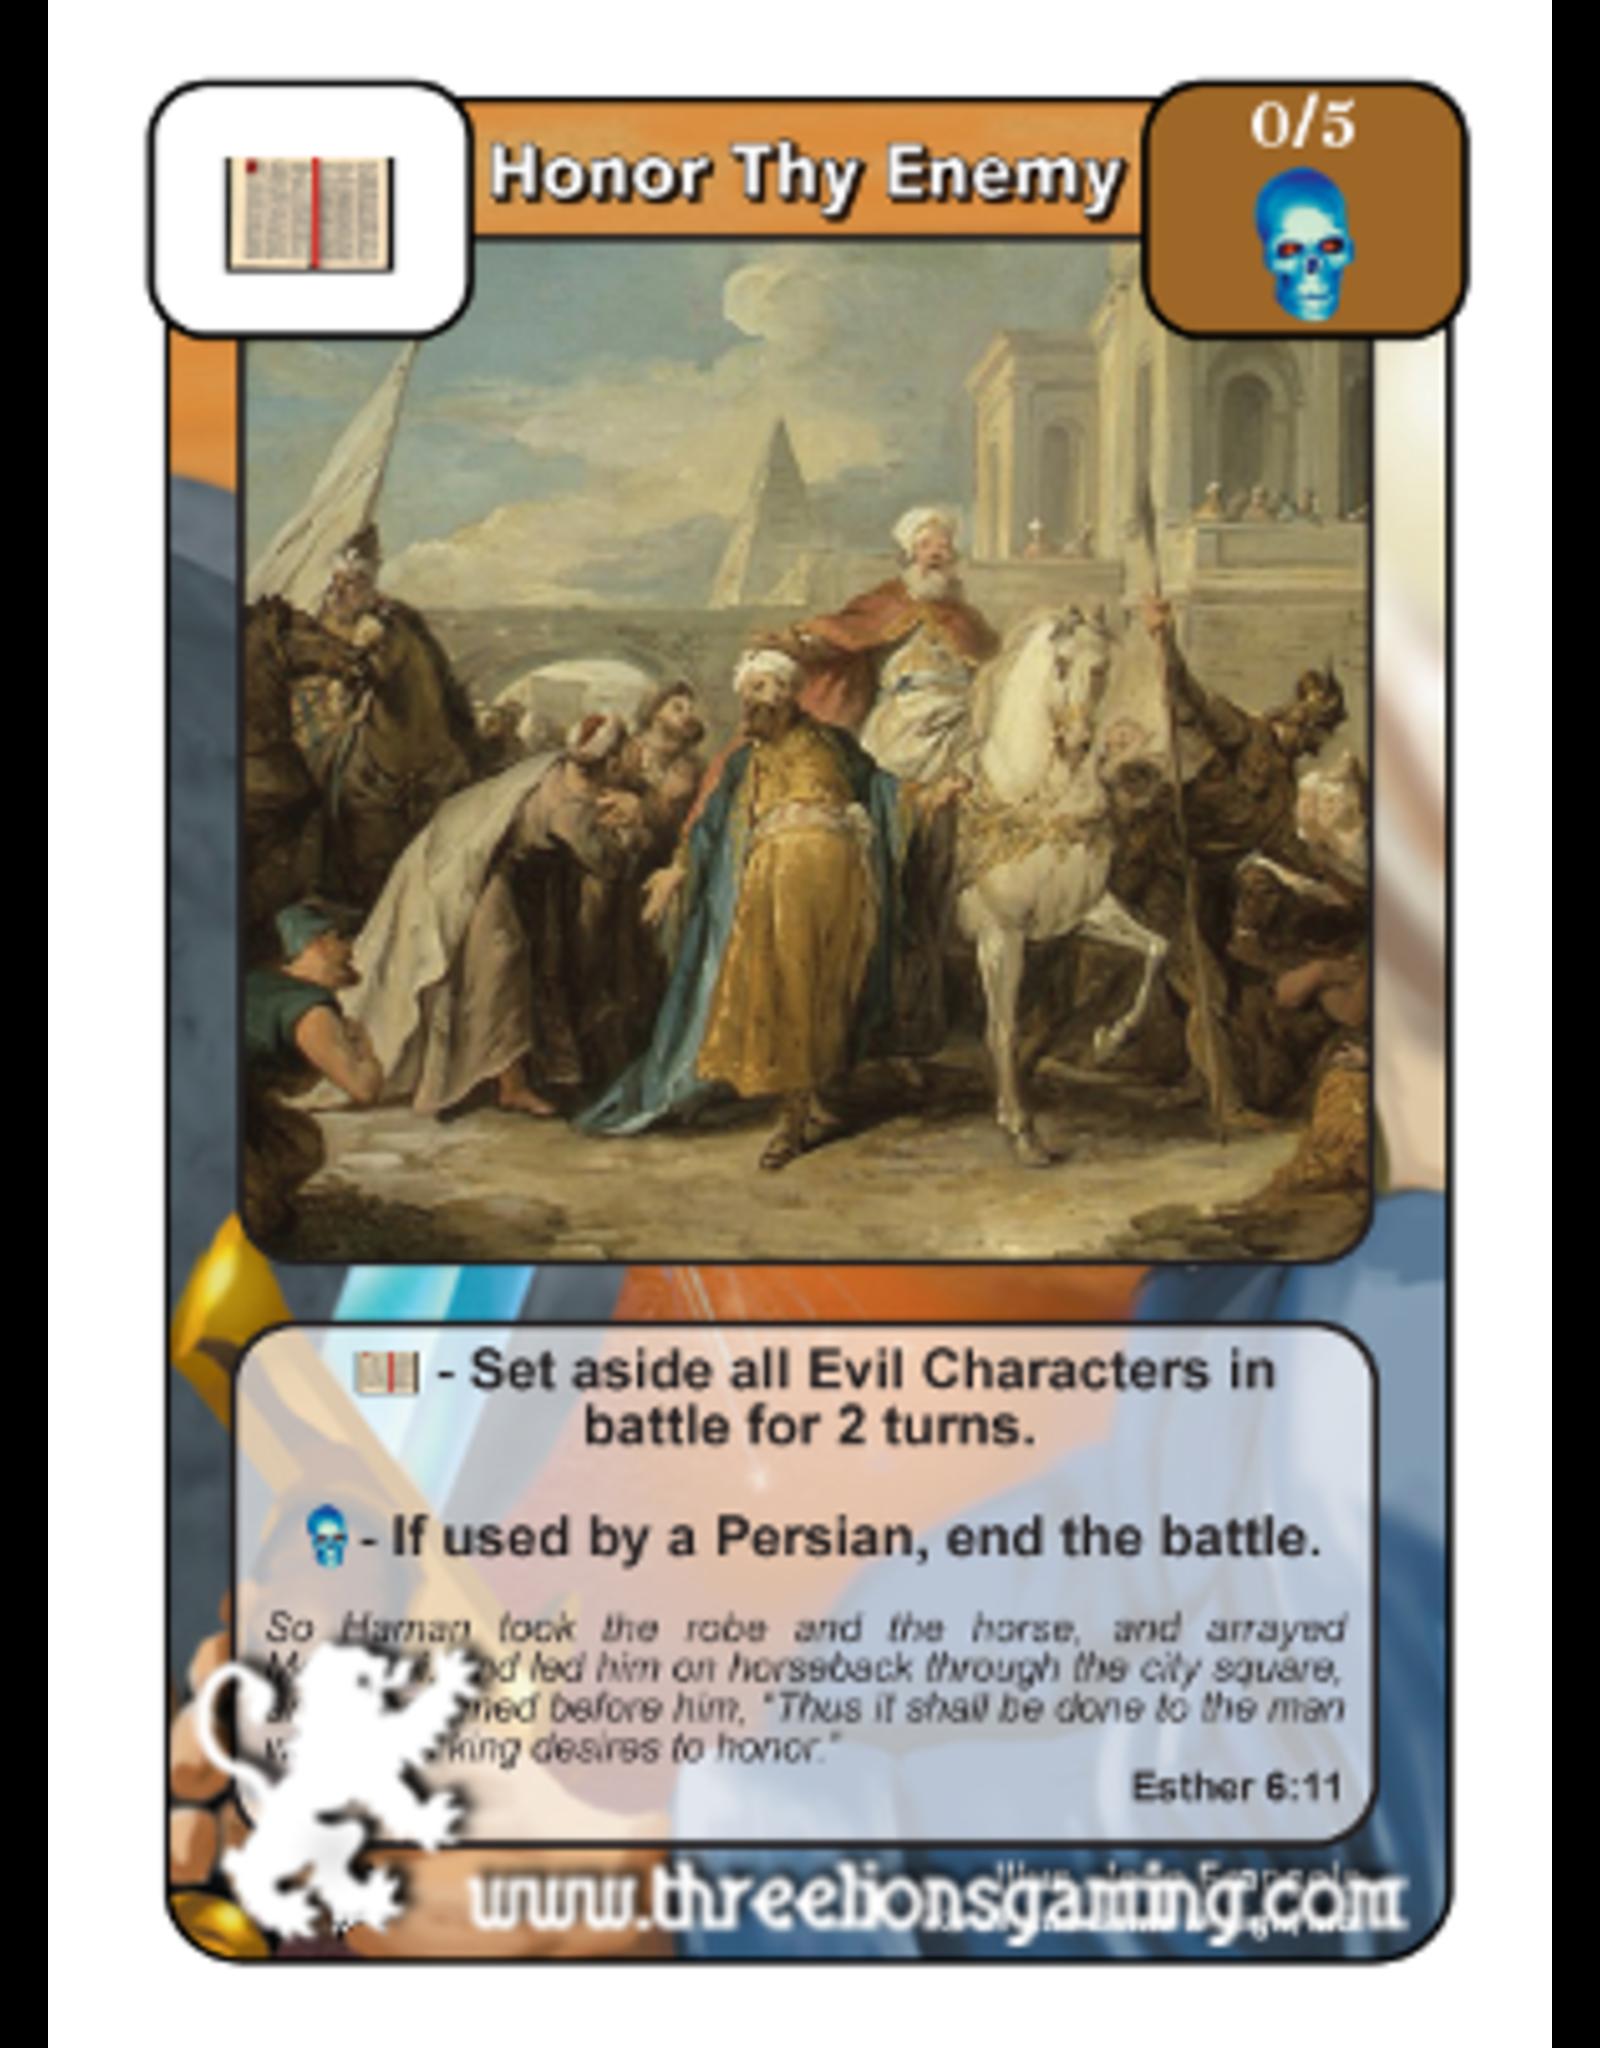 PoC: Honor Thy Enemy